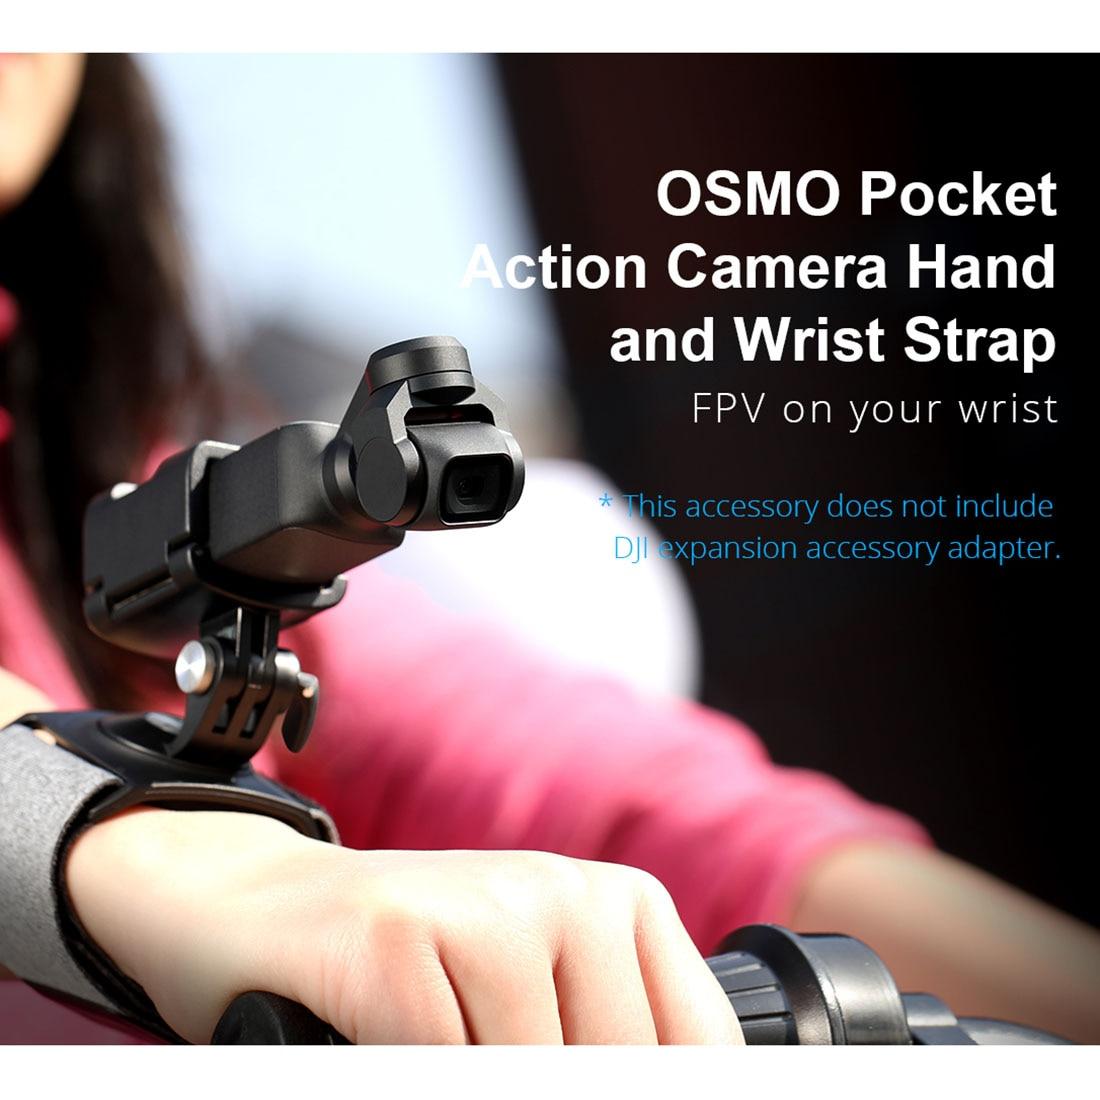 PGYTECH pour OSMO ACTION 360 Rotation poignet ceinture dragonne bande fixe pour DJI OSMO poche pour Gopro série Action Camera RC